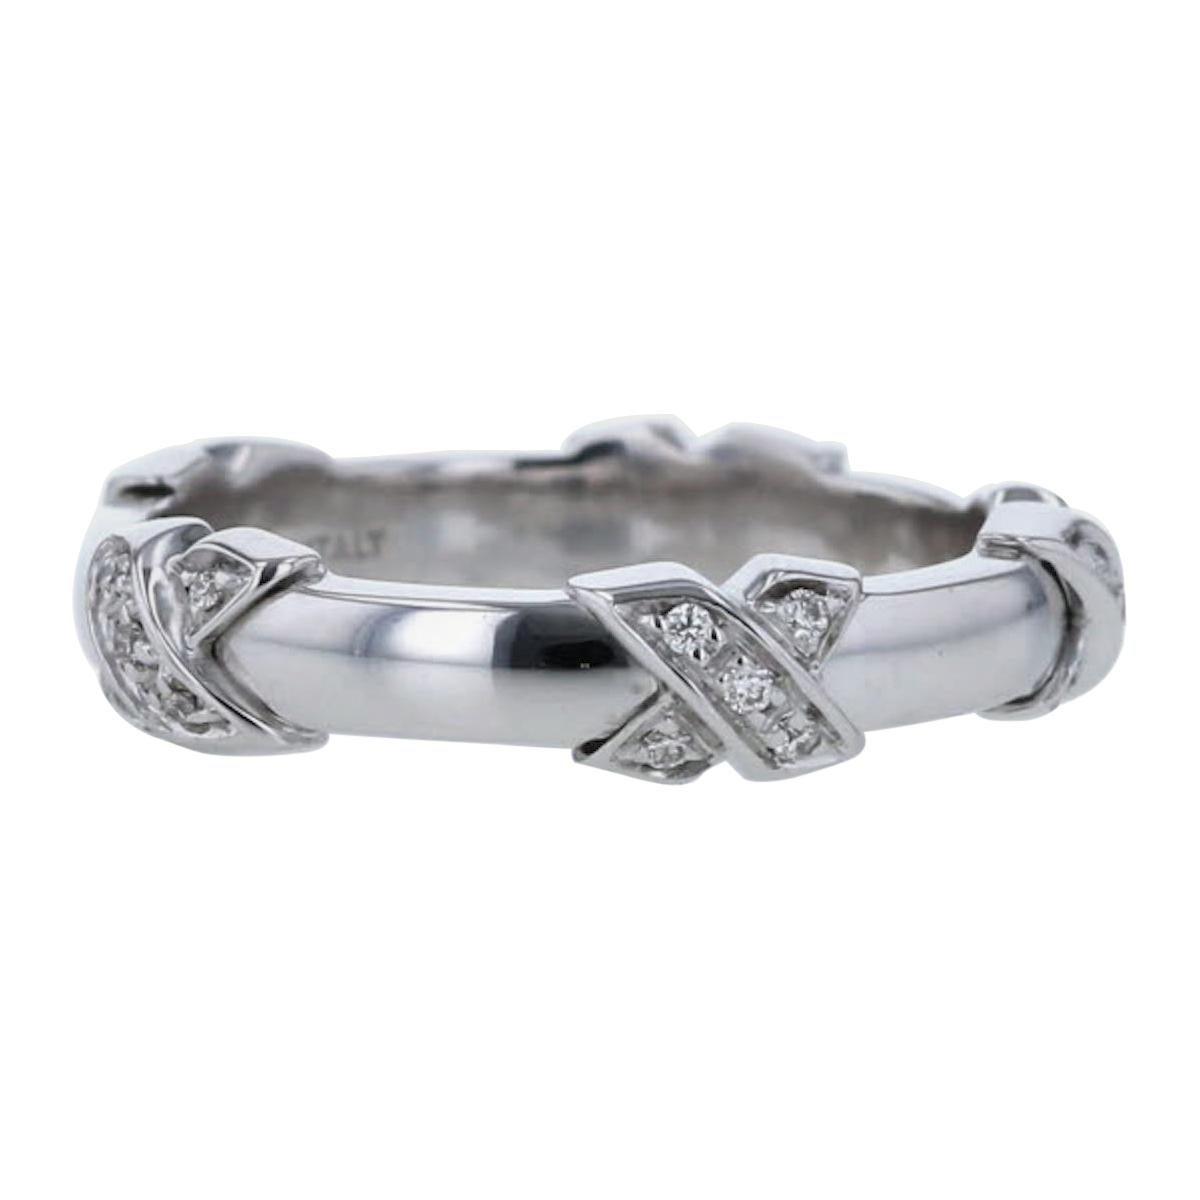 Tiffany & Co Diamond Signature X Ring in 18 Karat White Gold